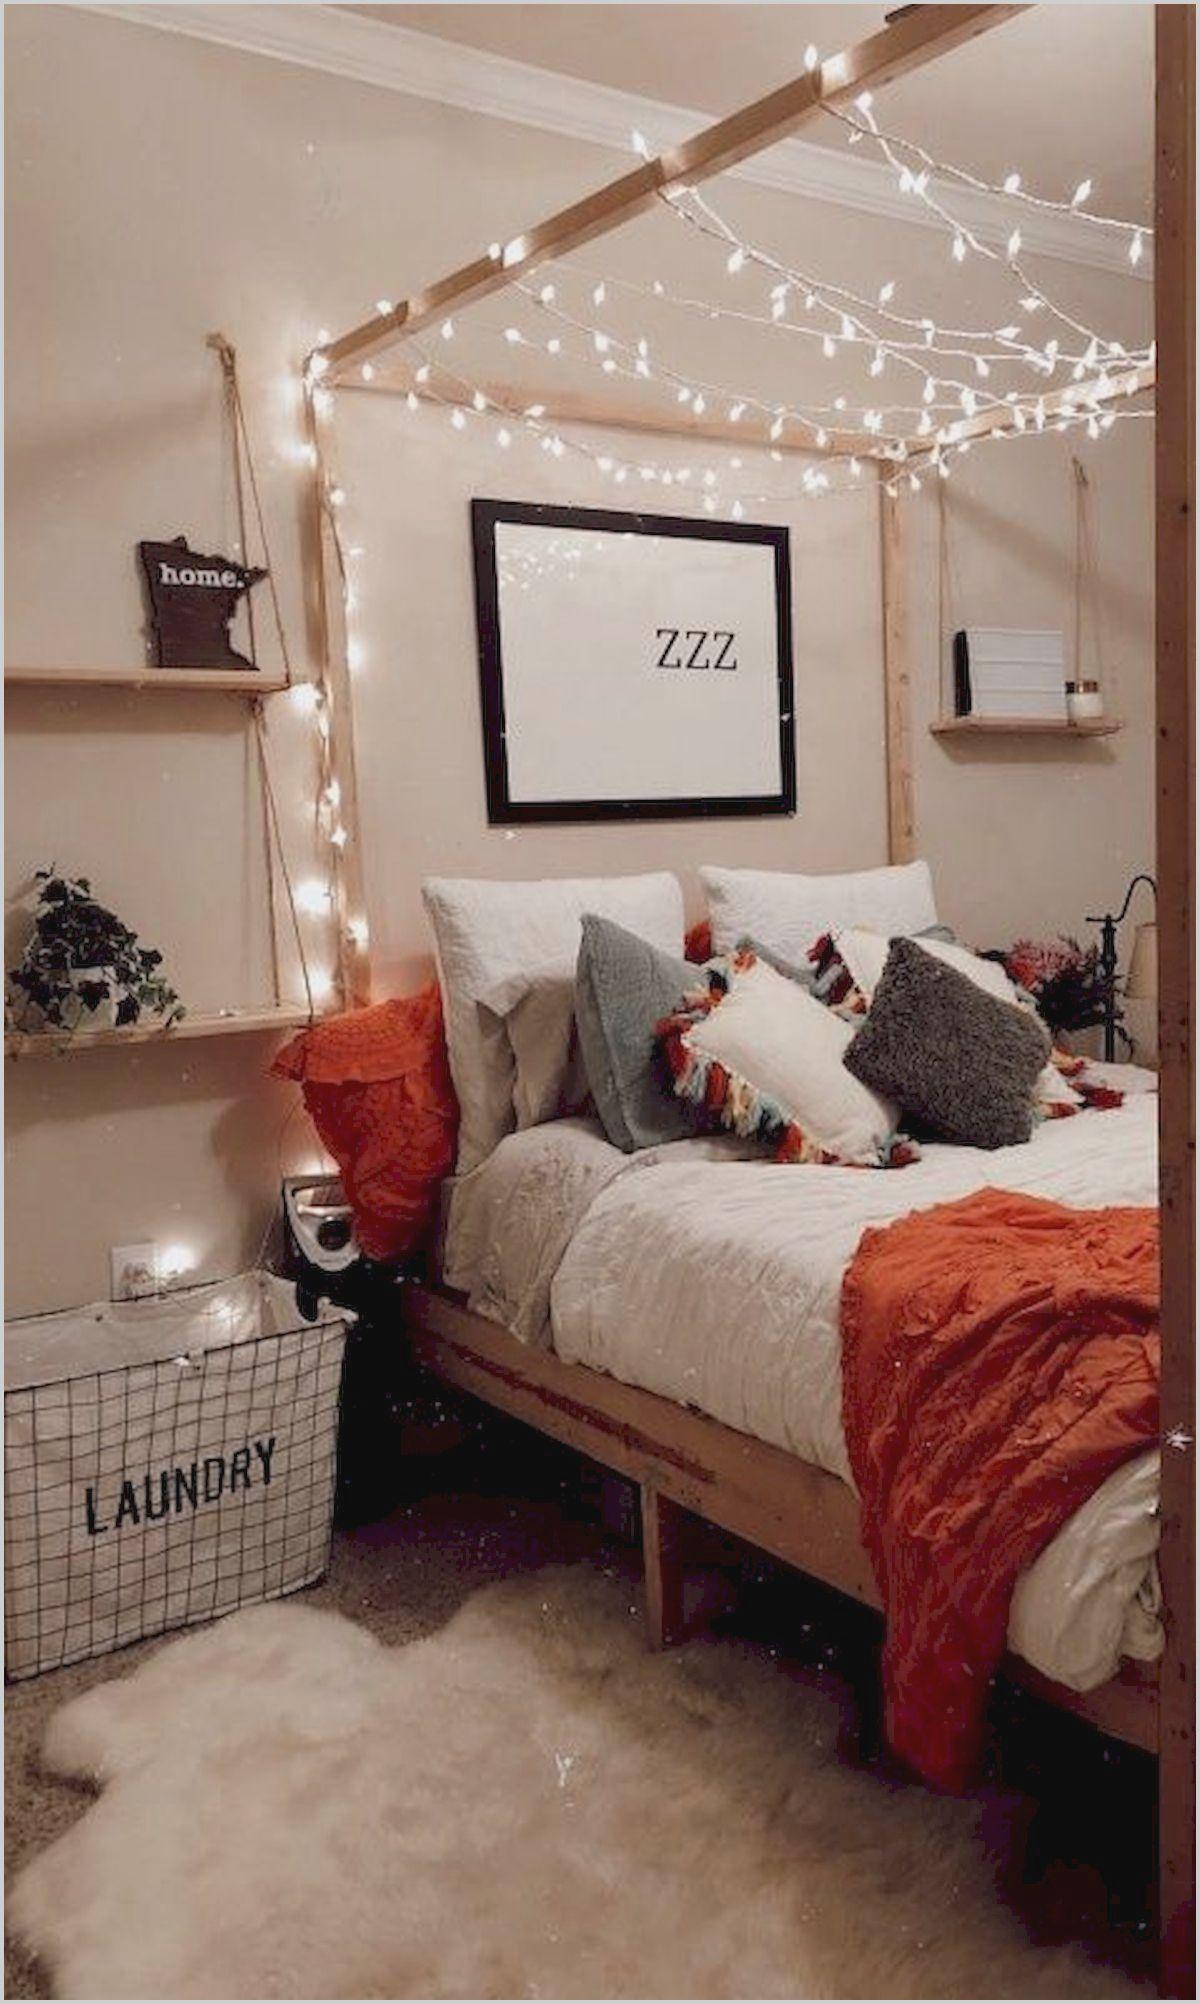 Bedroom Interior Design Ideas Pinterest Decoracion De Habitaciones Decoracion De La Habitacion Dormitorios